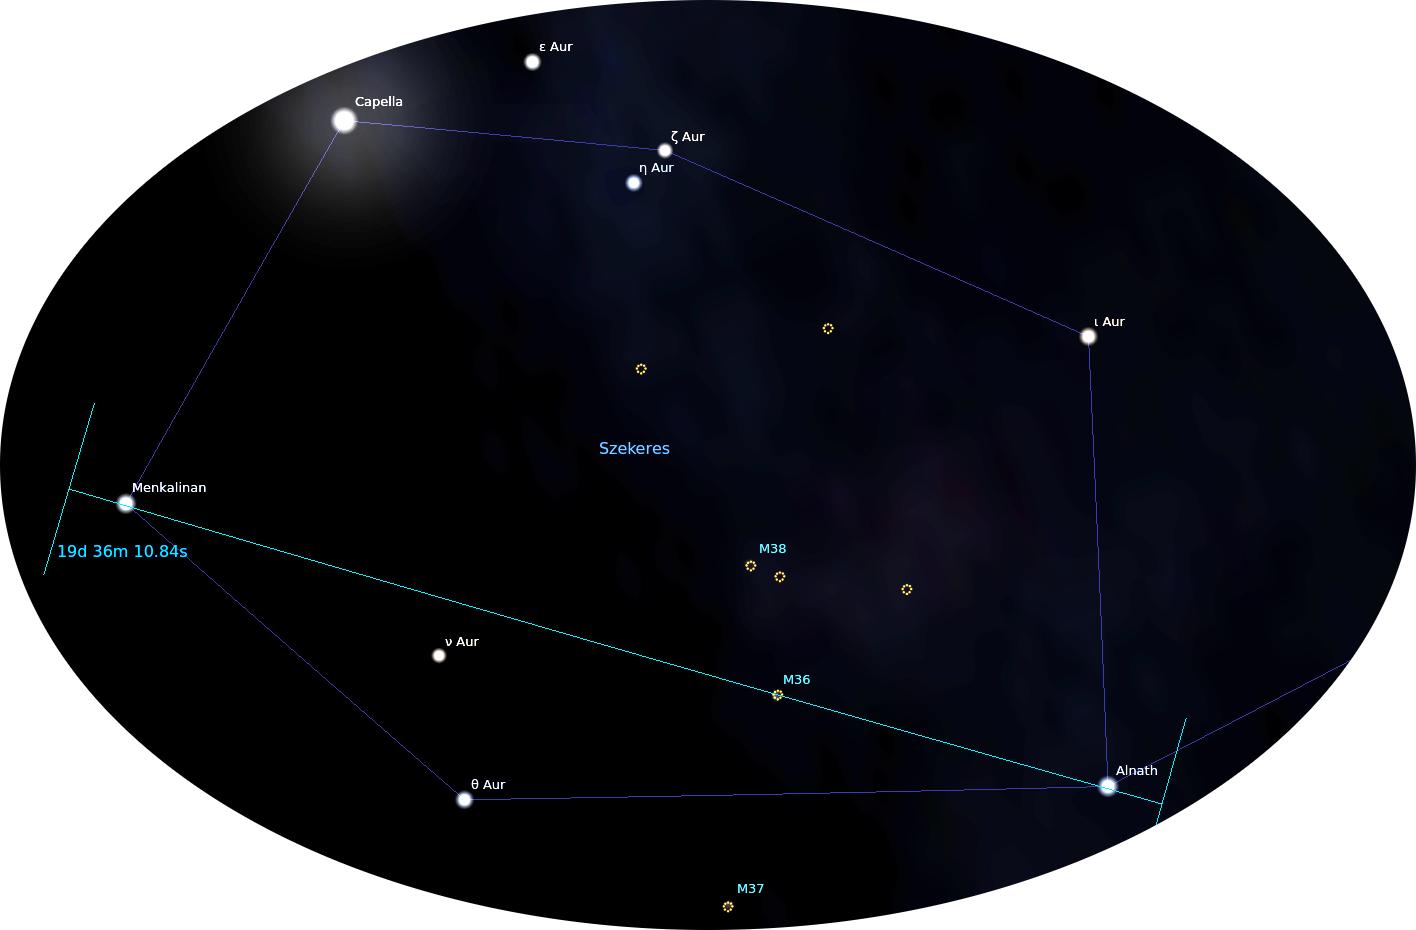 Szekeres M36, M37, M38